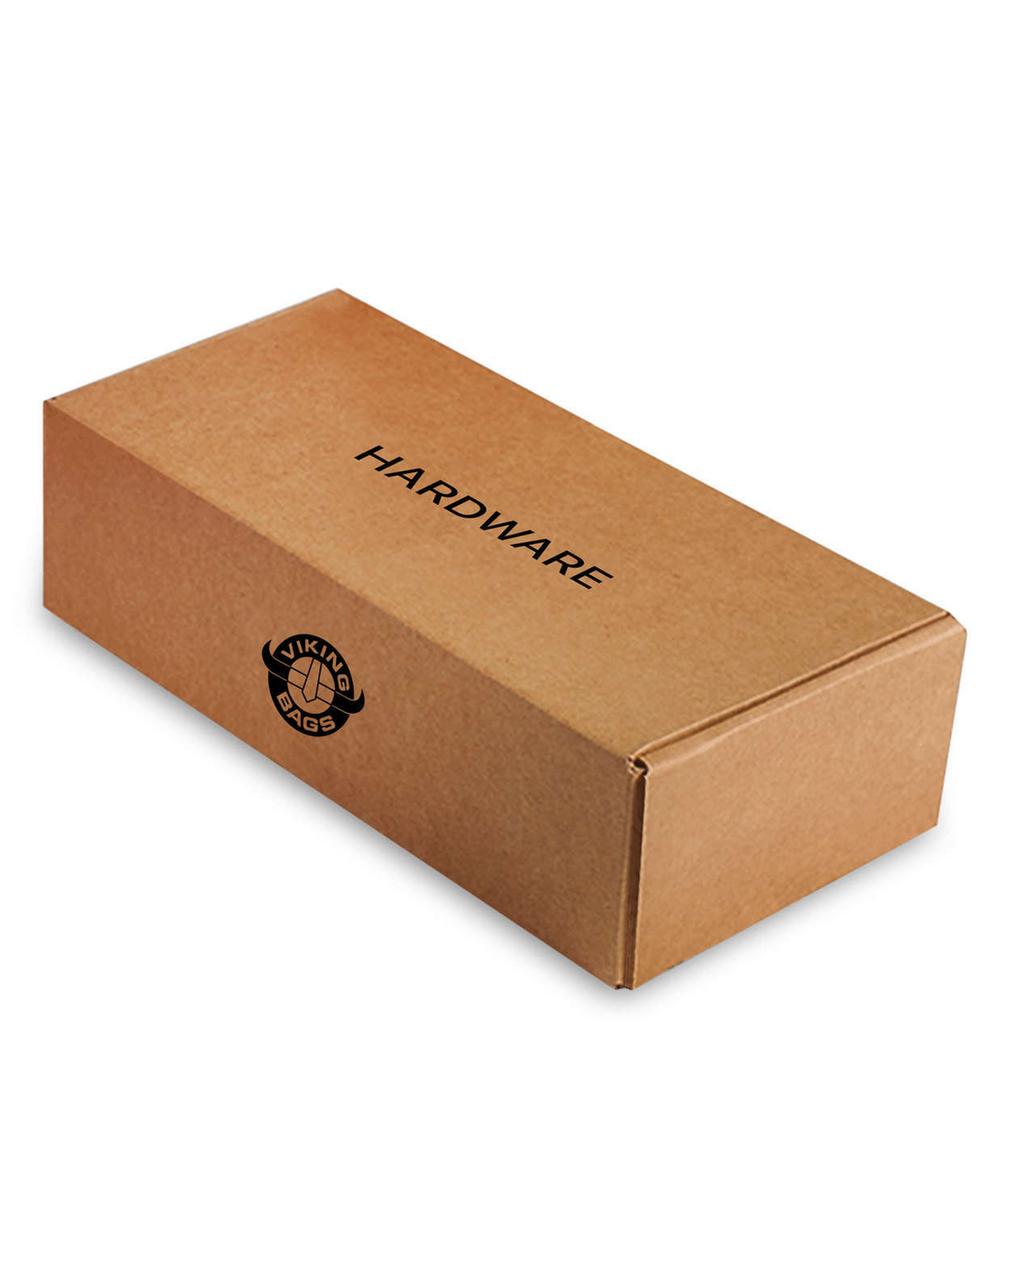 Honda 1100 Shadow Sabre Viking Lamellar Leather Covered Shock Cutout Hard Saddlebag Box